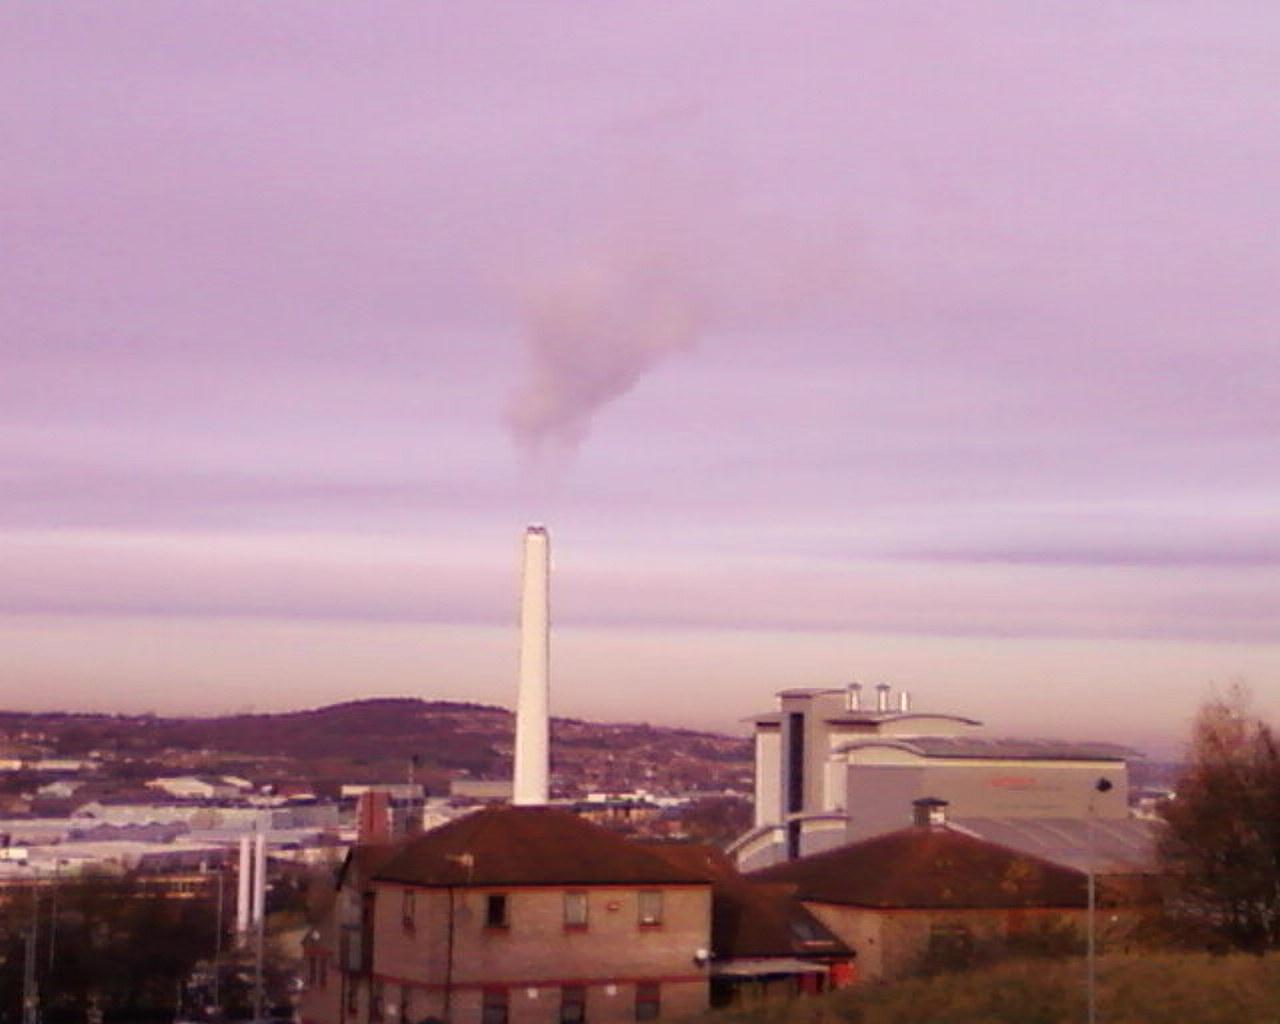 Incinerator run by Veolia Sheffield